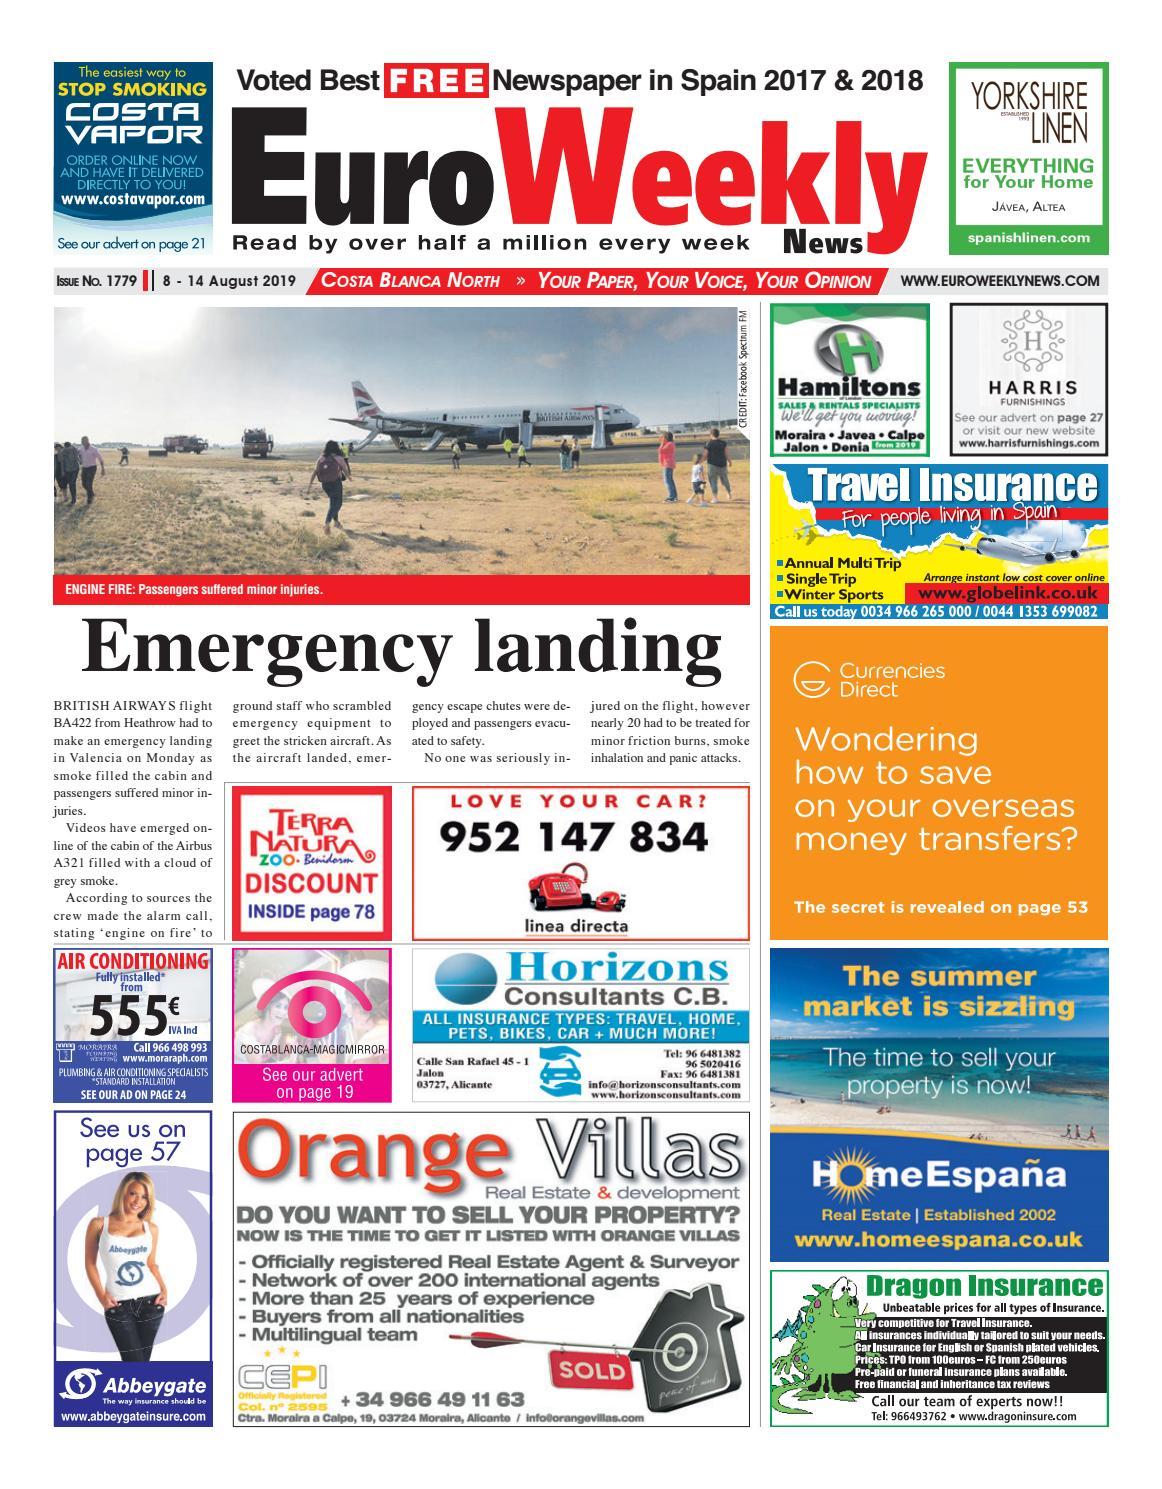 Euro Weekly News - Costa Blanca North 8 - 14 August 2019